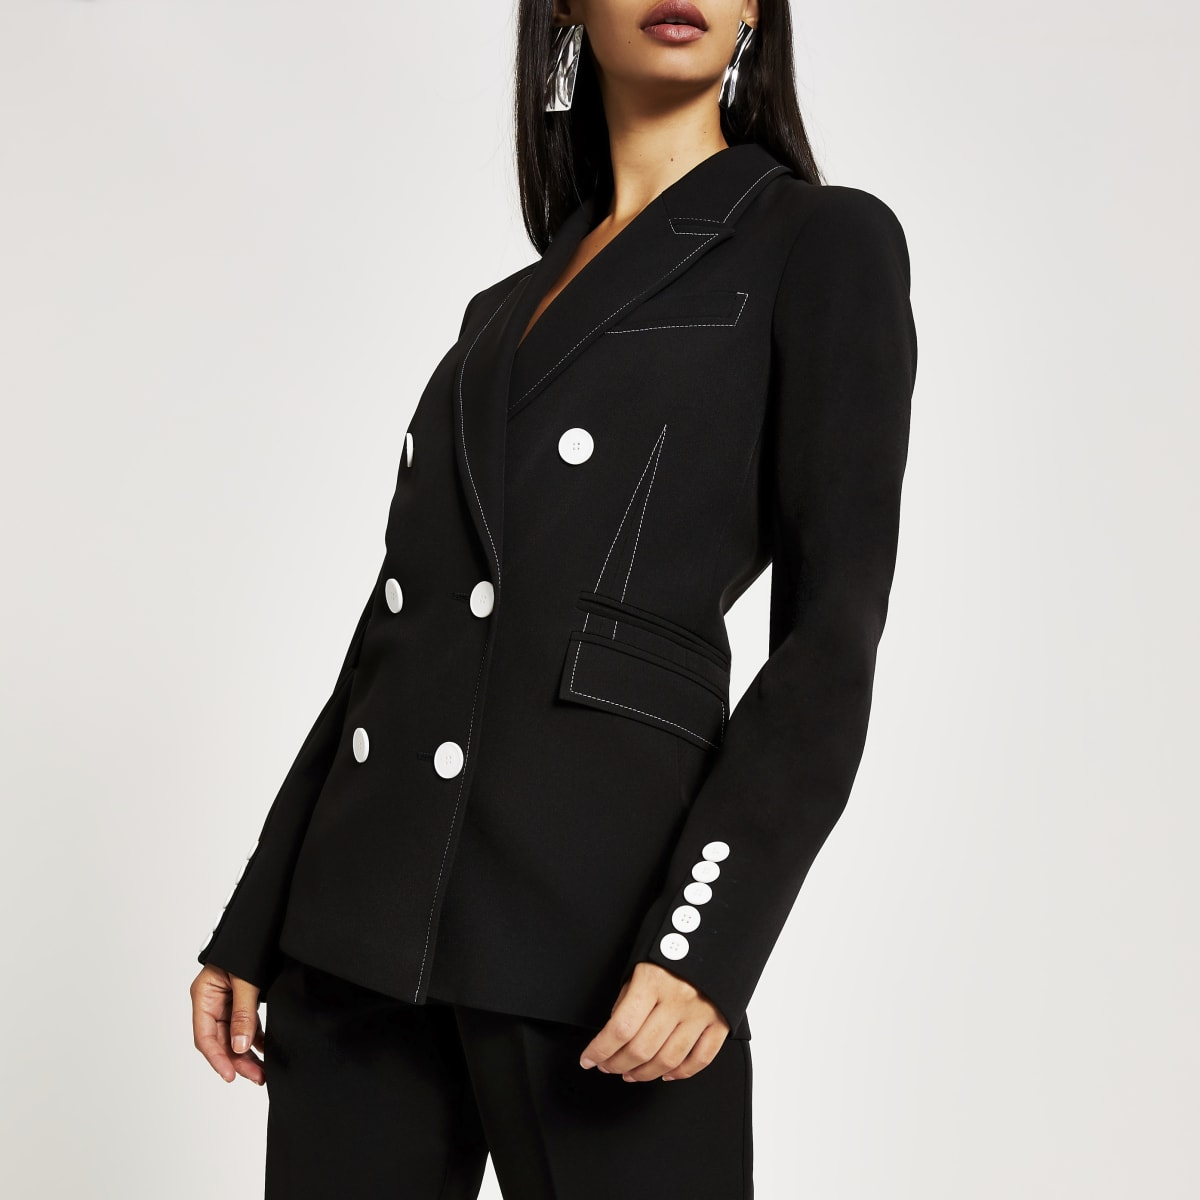 Zwarte double-breasted blazer met contrasterend stiksel